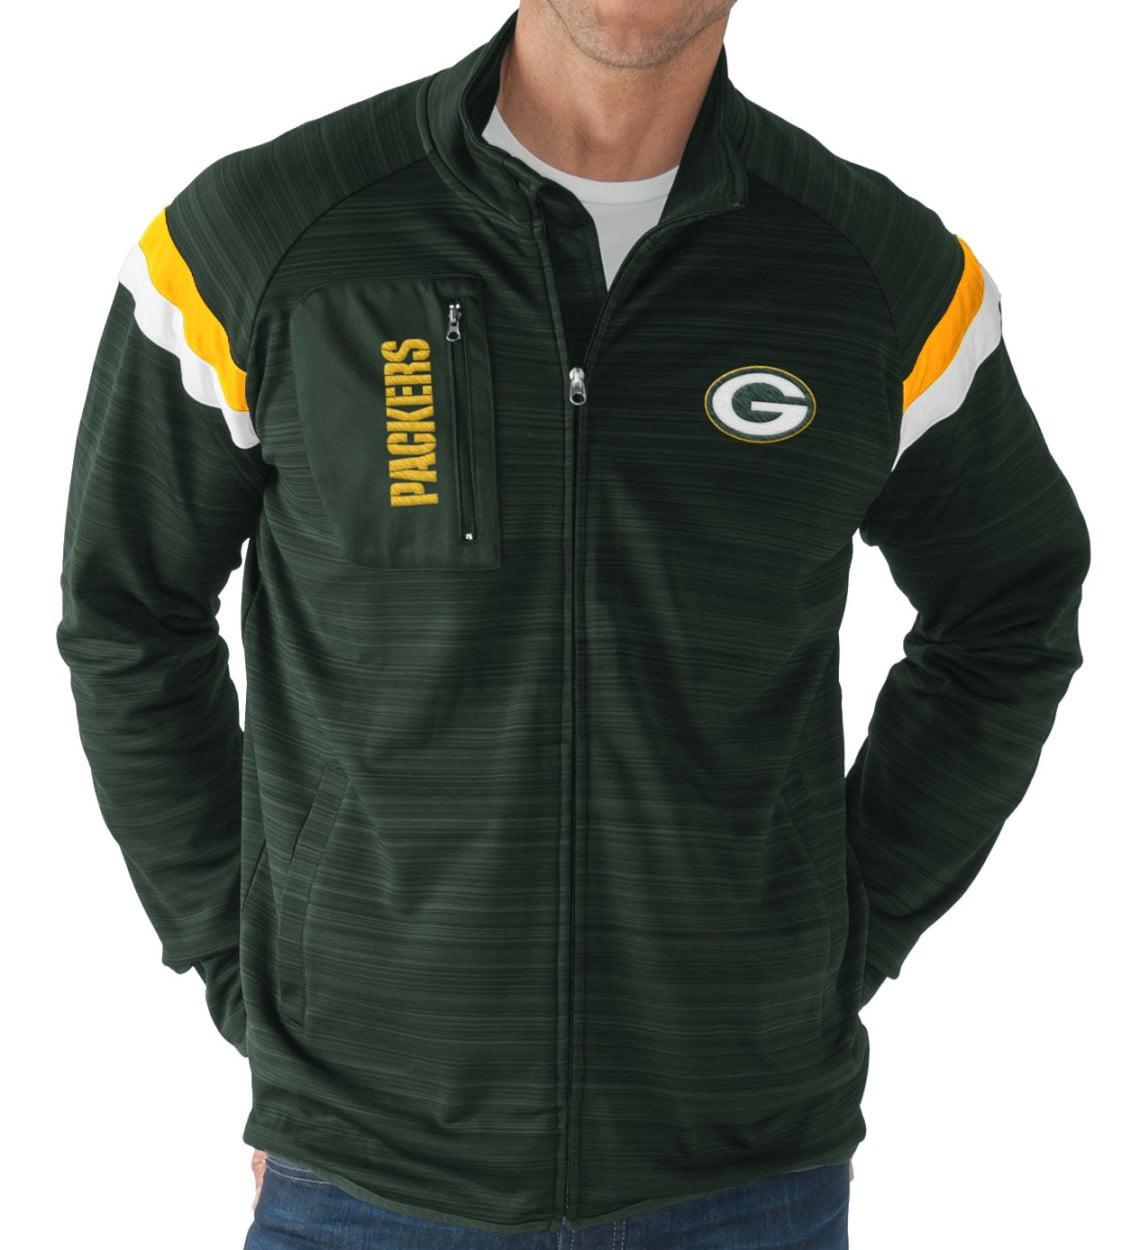 "Green Bay Packers NFL G-III ""Wild Card"" Men's Full Zip Track Jacket by G-III Sports"